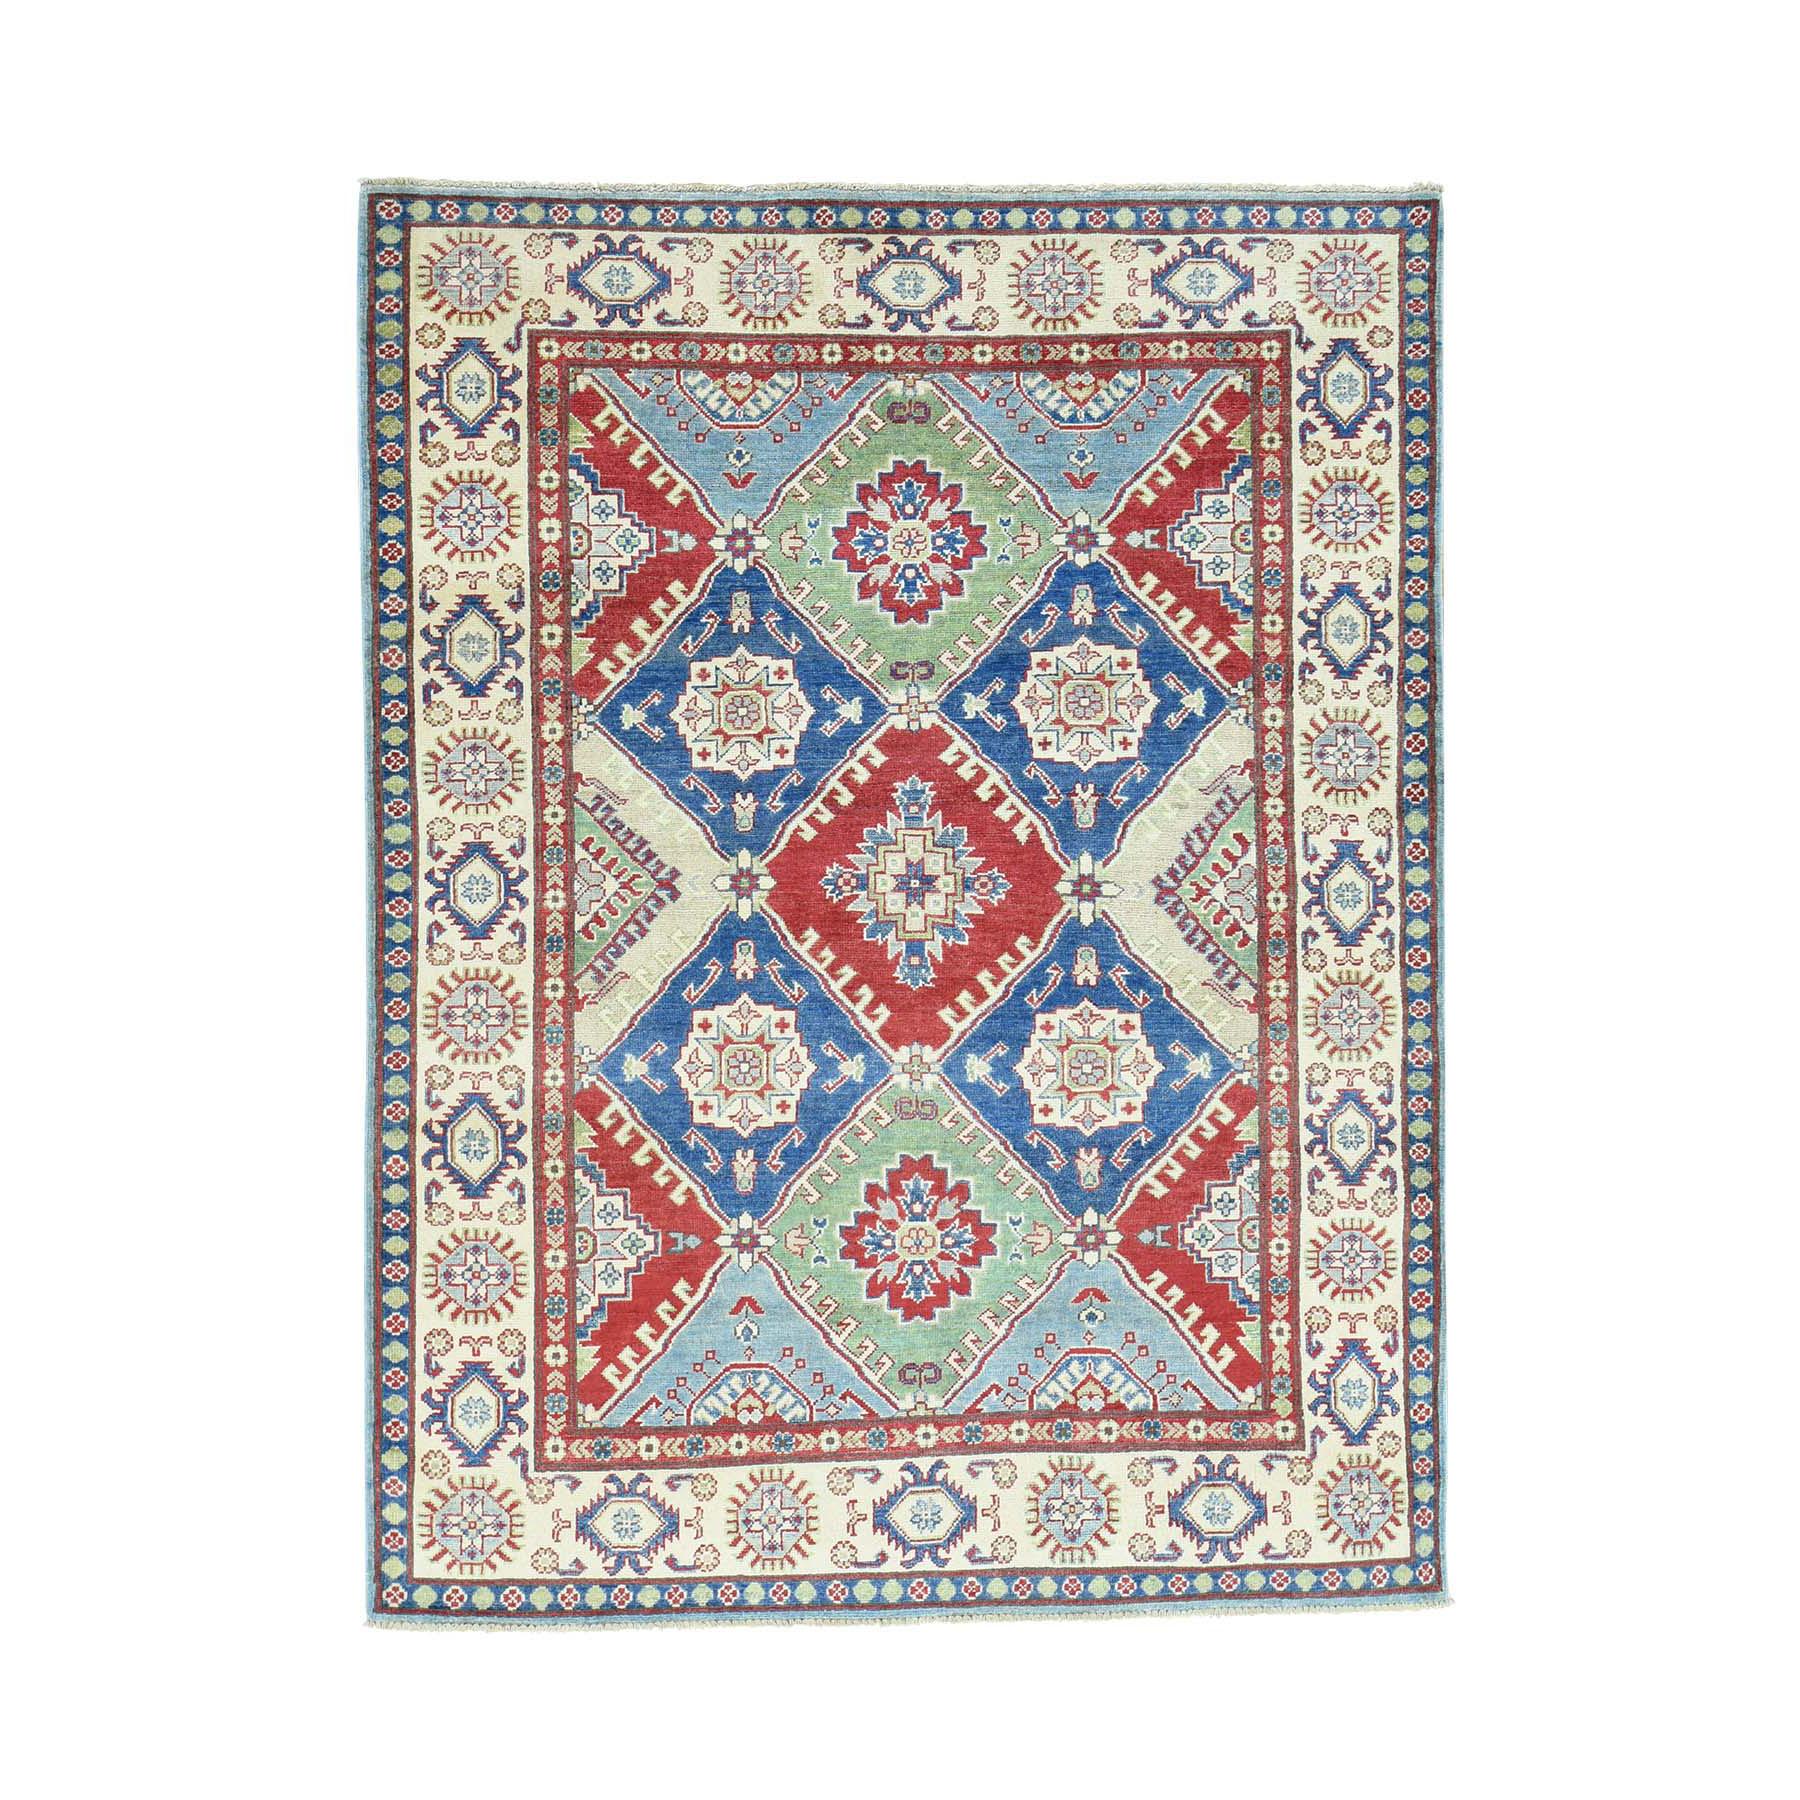 "5'4""x7'1"" Hand-Knotted Kazak Tribal And Geometric Design Pure Wool Rug"